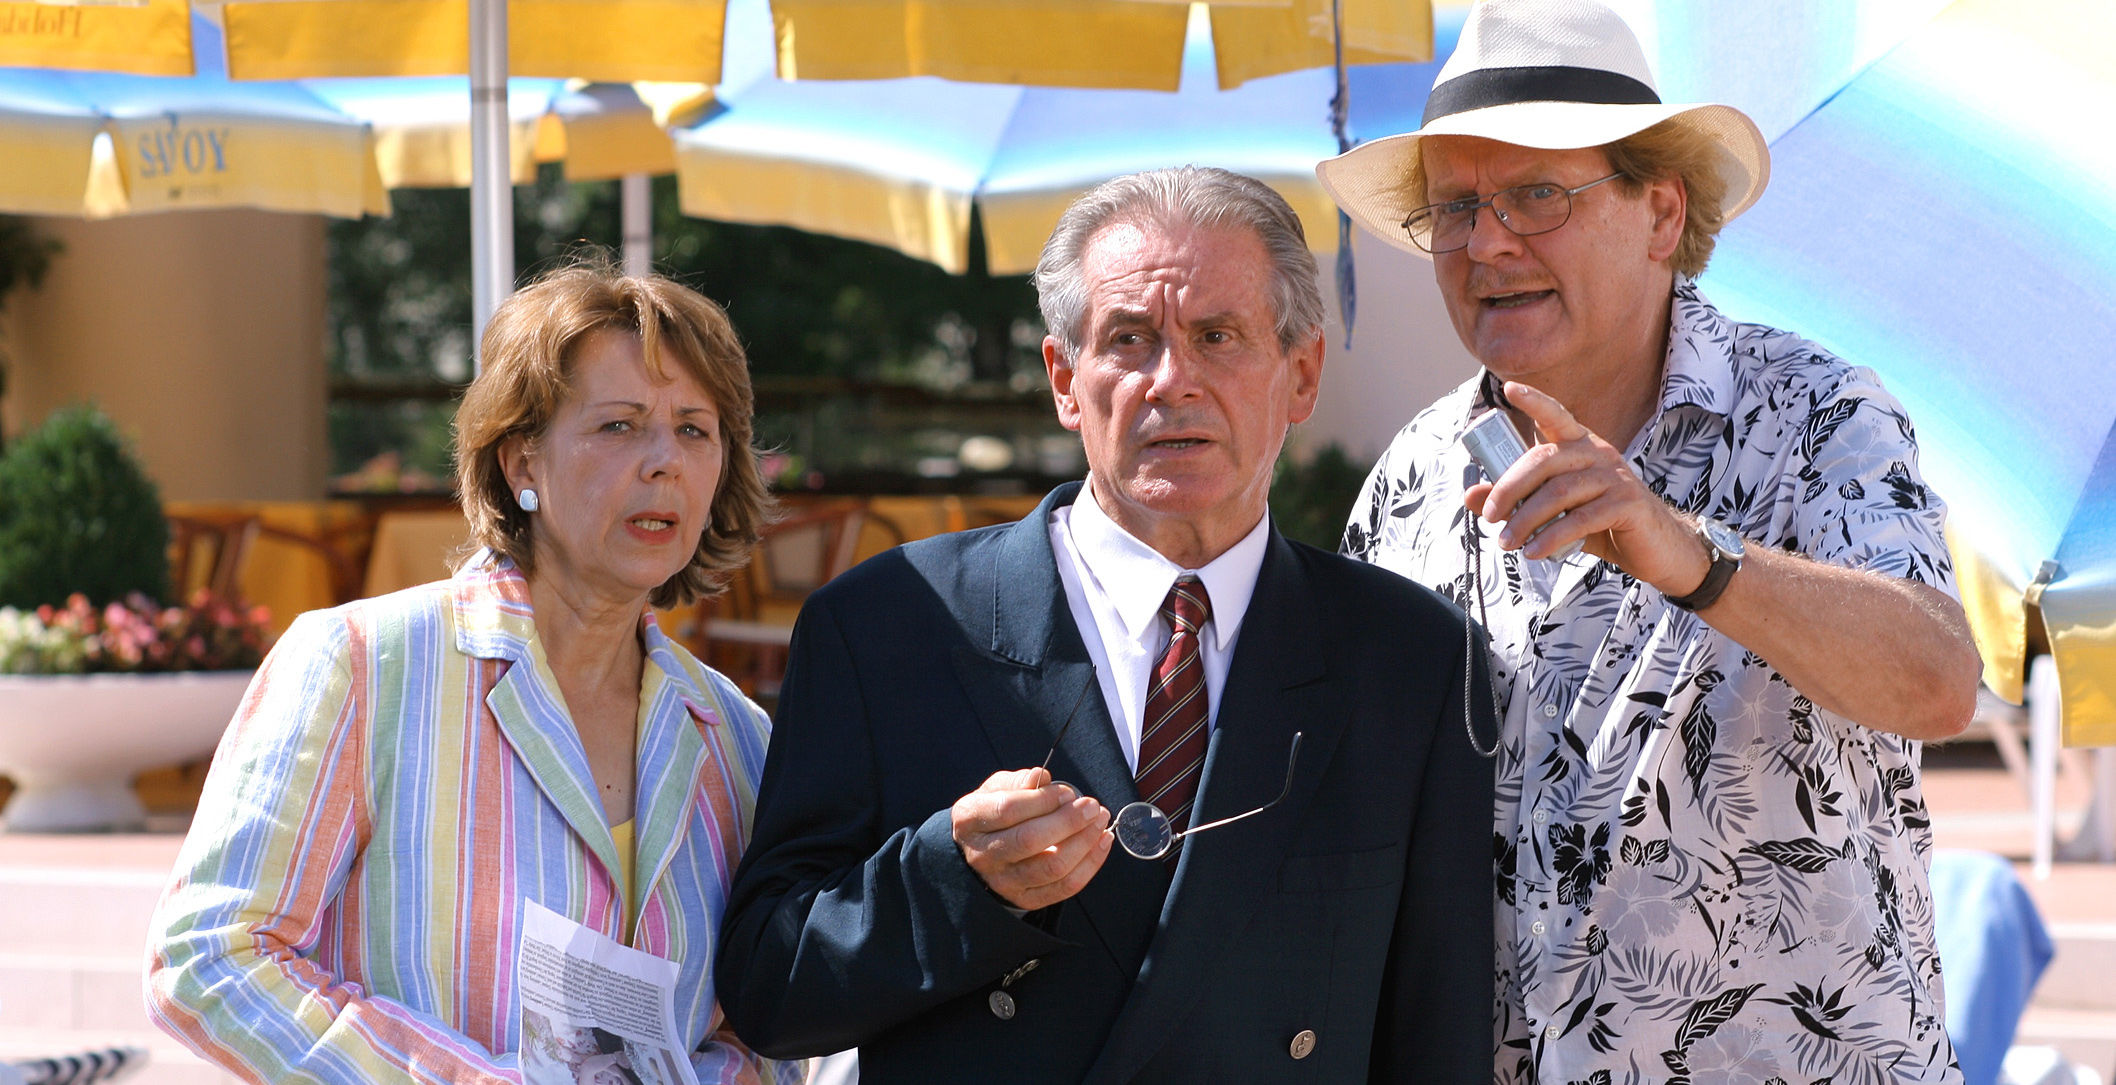 Uschi Wolff (Roswitha Gold), NN (Hoteldirektor), Peter Fricke (Albert Summer)